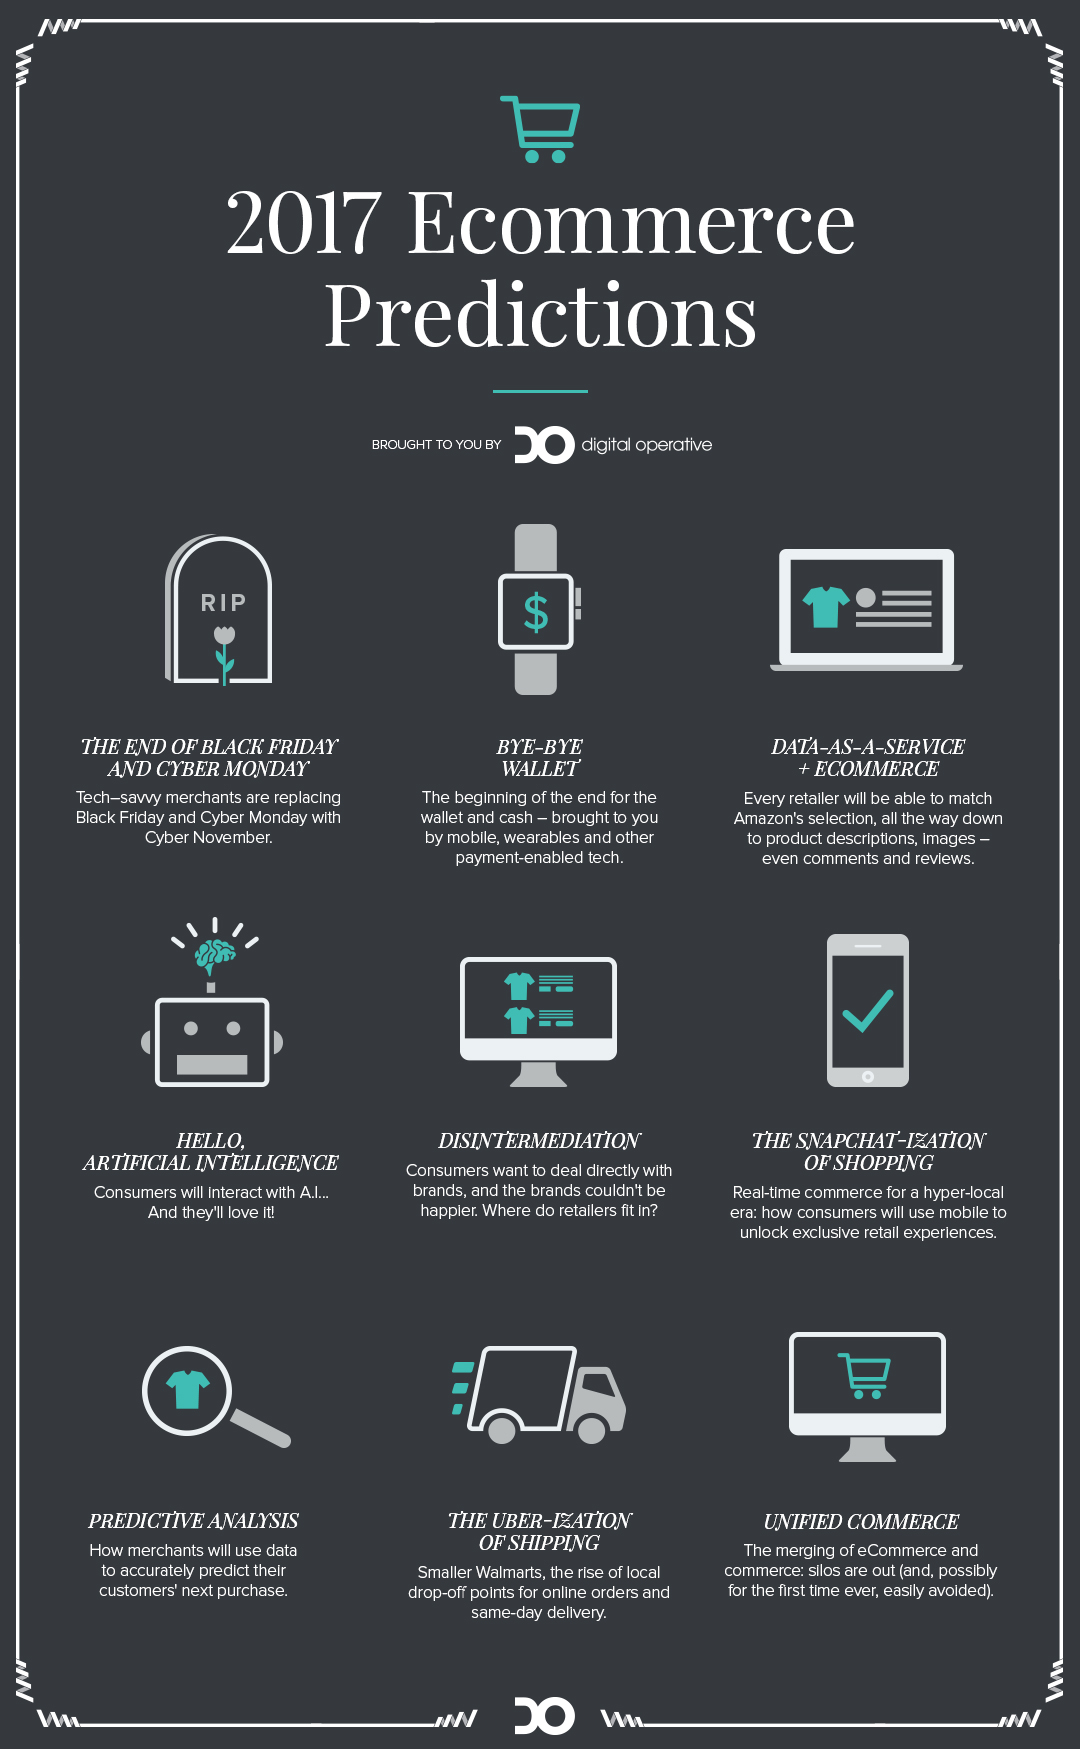 2017 eCommerce Predictions